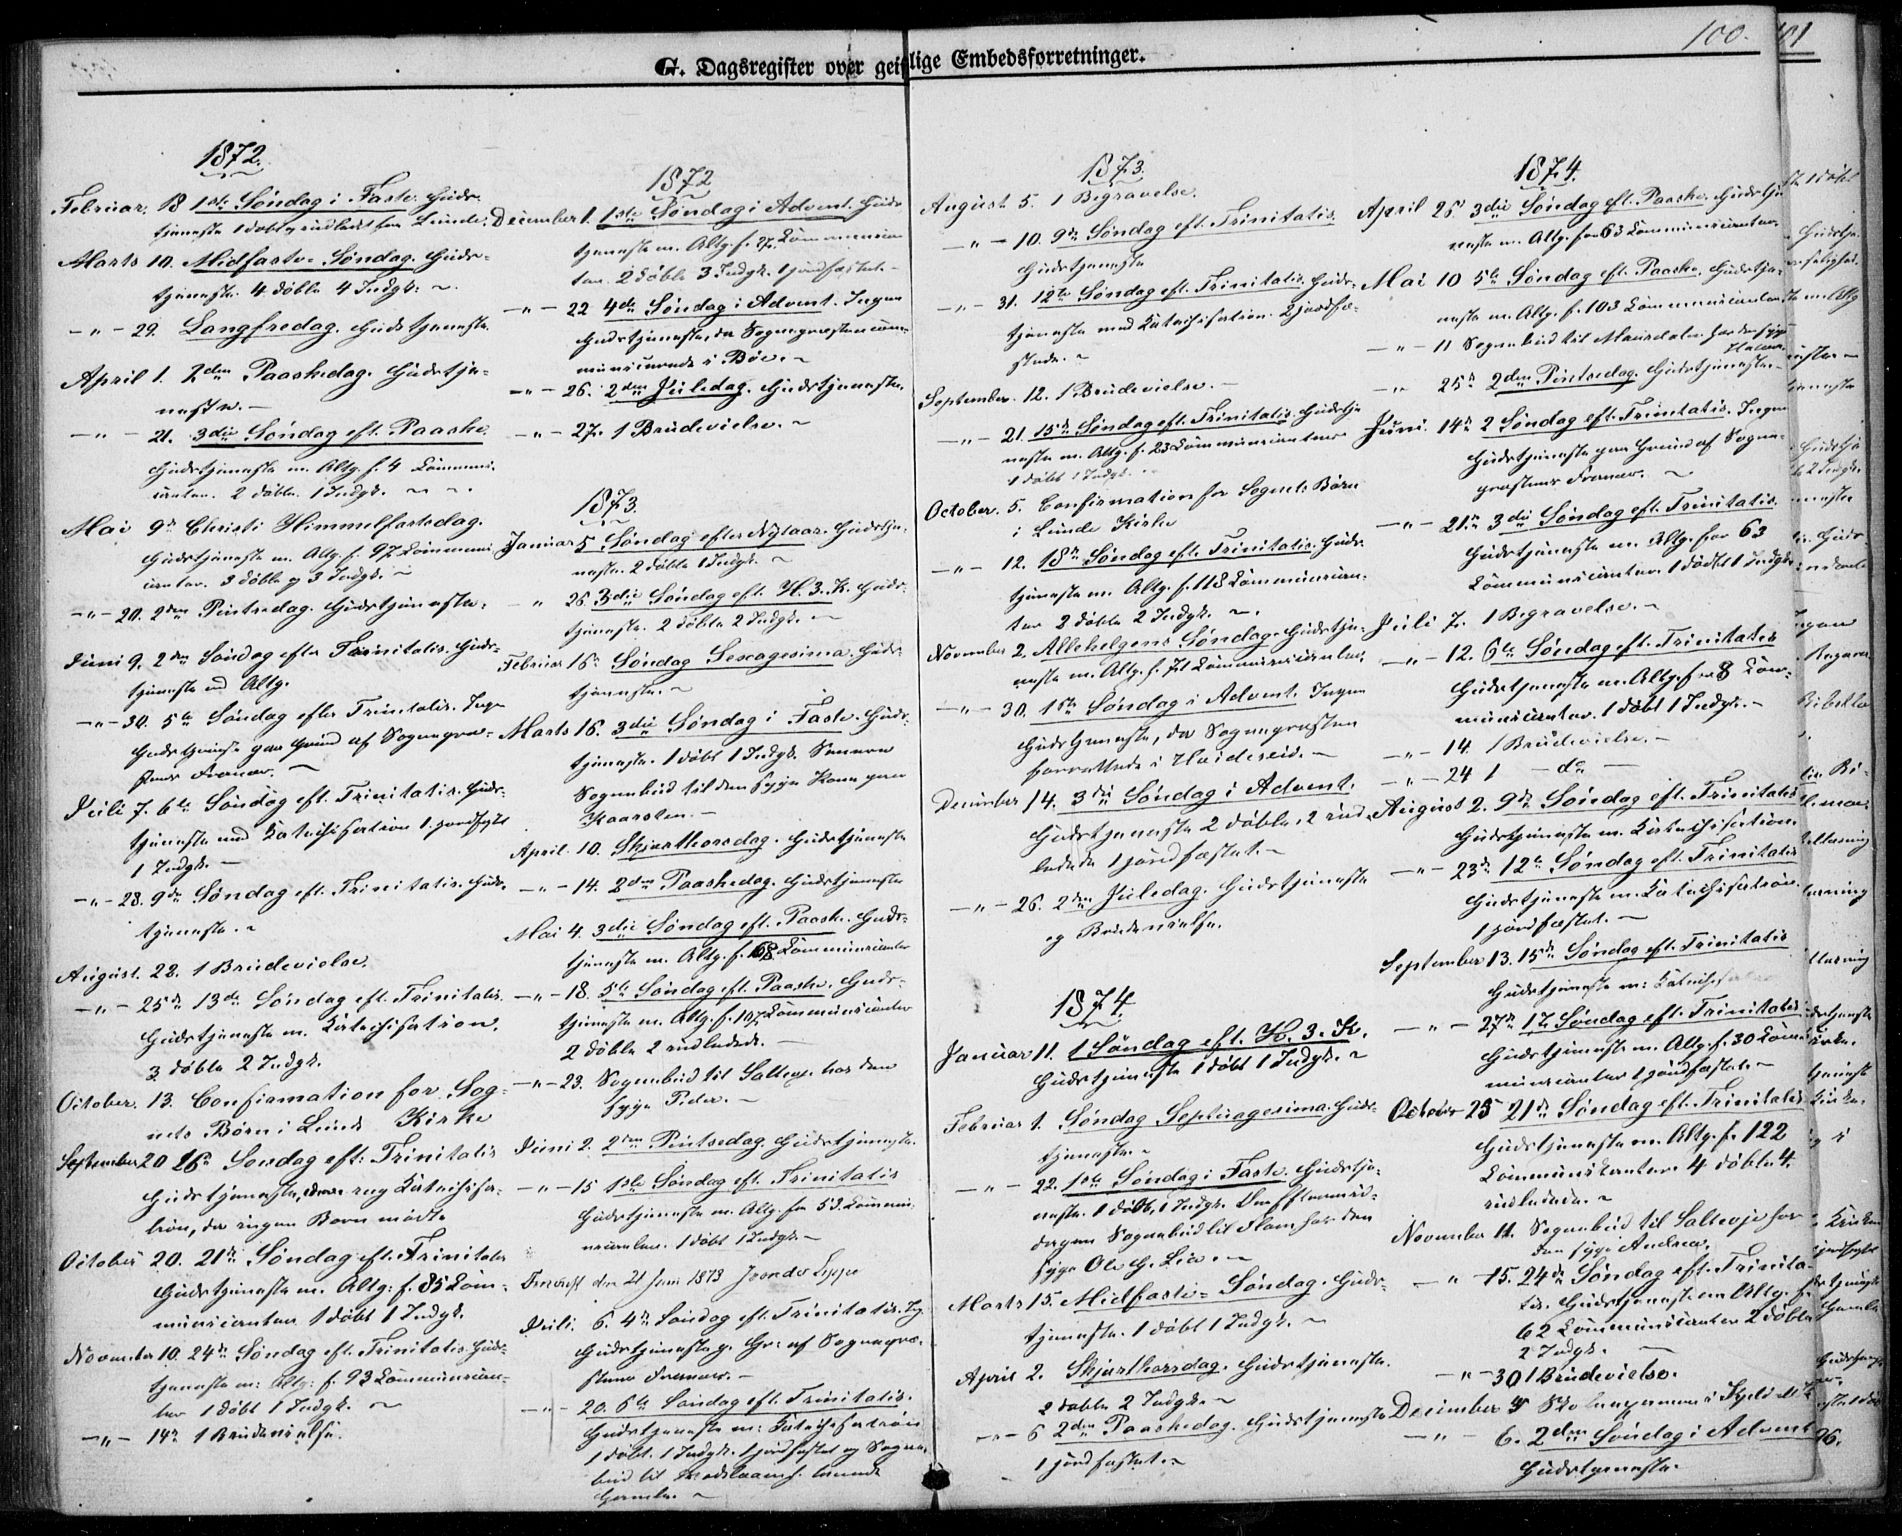 SAKO, Lunde kirkebøker, F/Fb/L0002: Ministerialbok nr. II 2, 1861-1881, s. 100